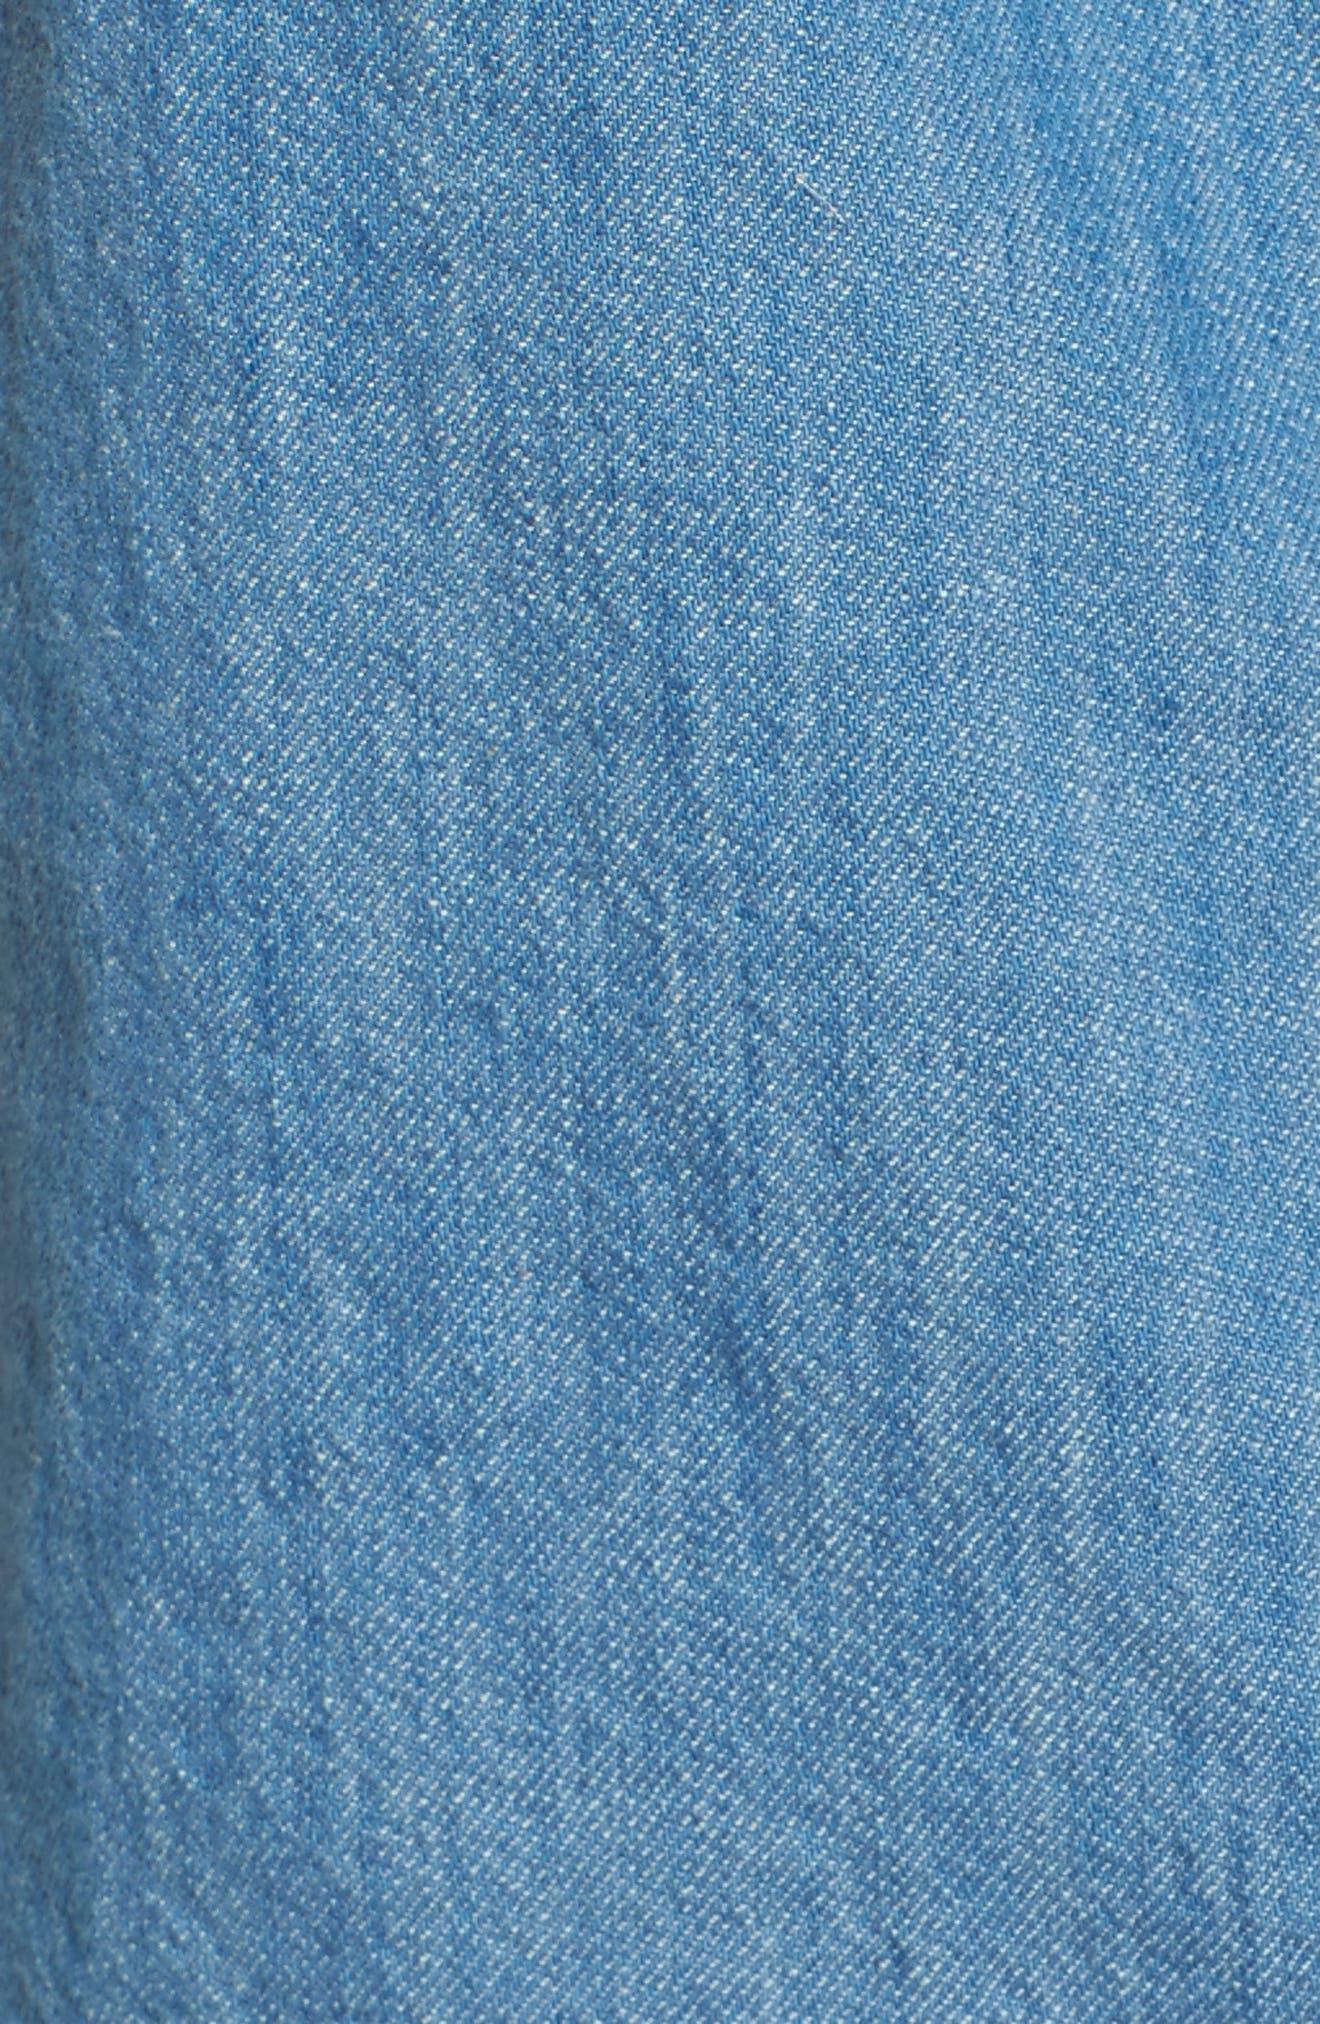 Asymmetrical Raw Edge Denim Top,                             Alternate thumbnail 5, color,                             Making Waves